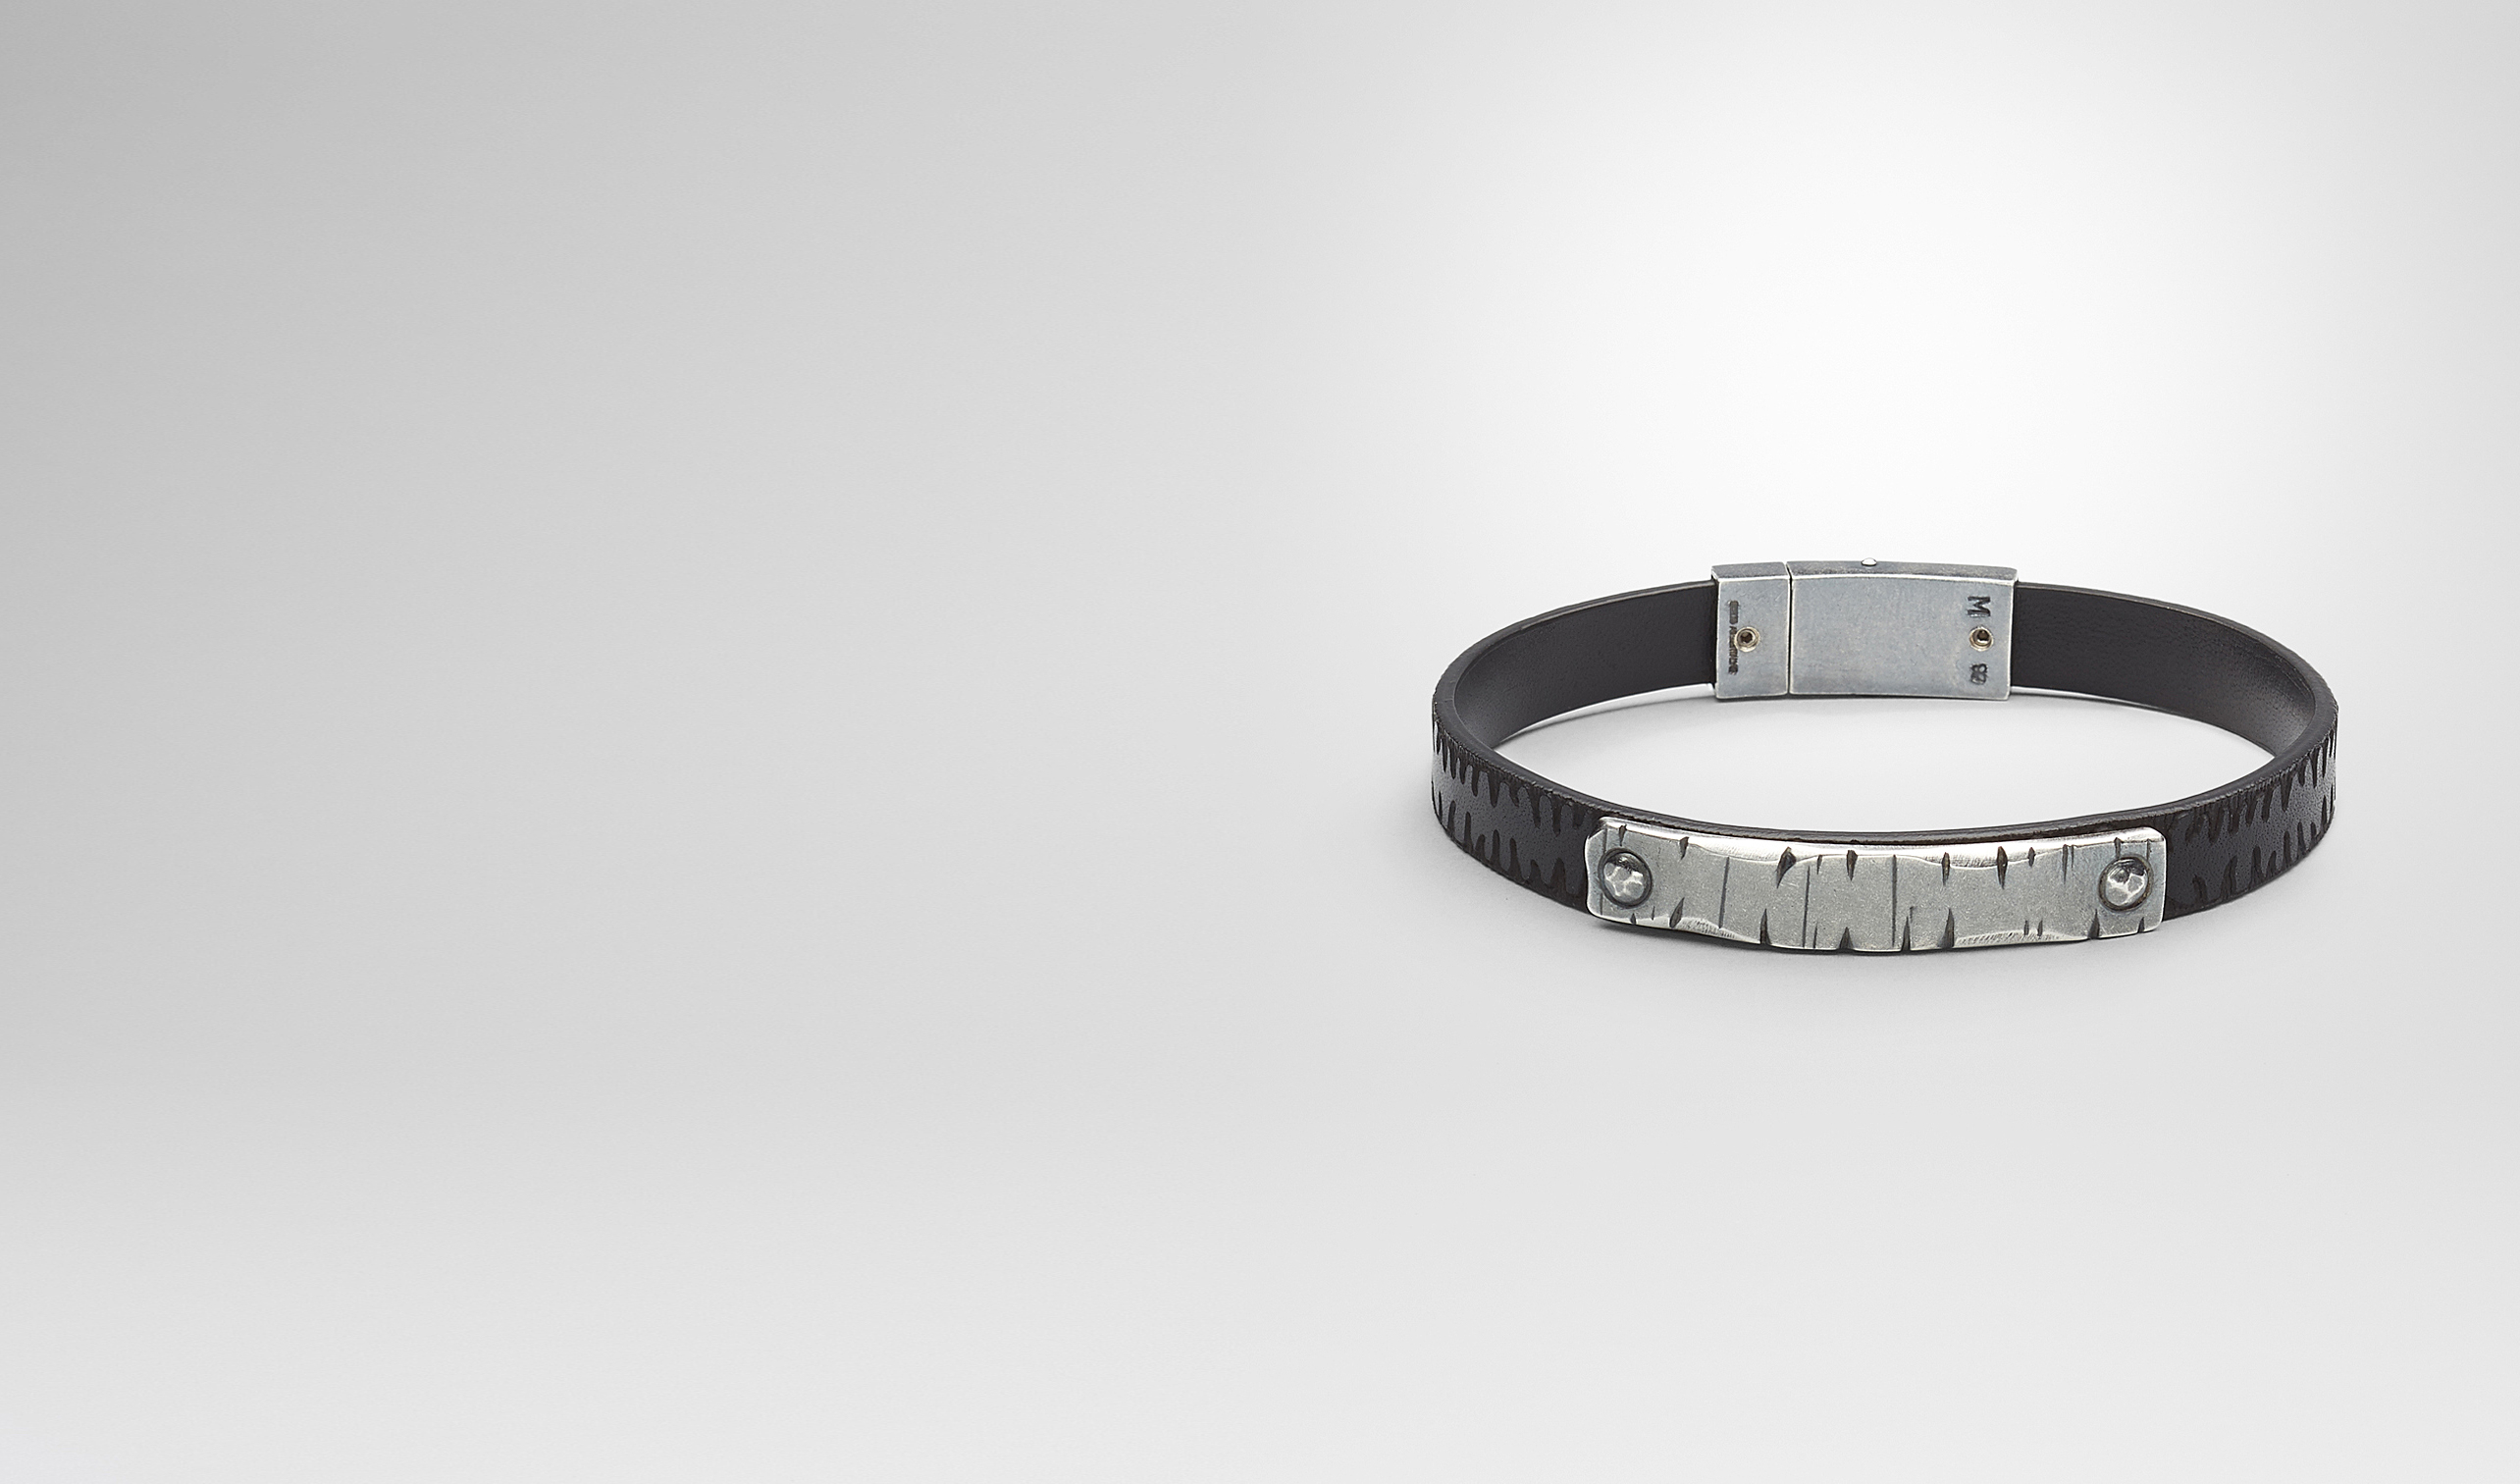 BOTTEGA VENETA Bracelet U Nero Intrecciato Oxidized Silver Cuir Bracelet pl